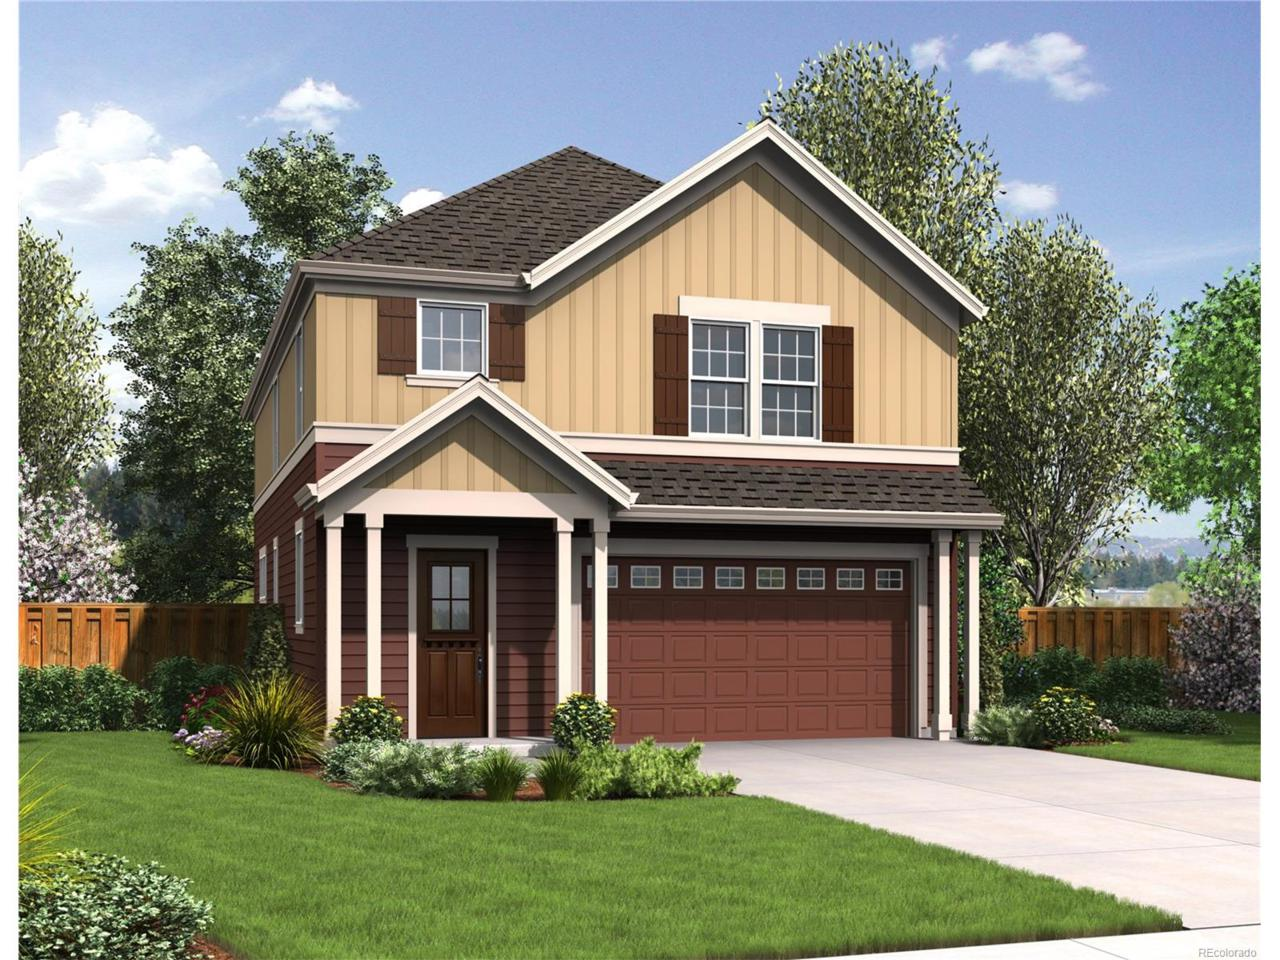 14415 E Elk Drive, Denver, CO 80239 (MLS #8738605) :: 8z Real Estate